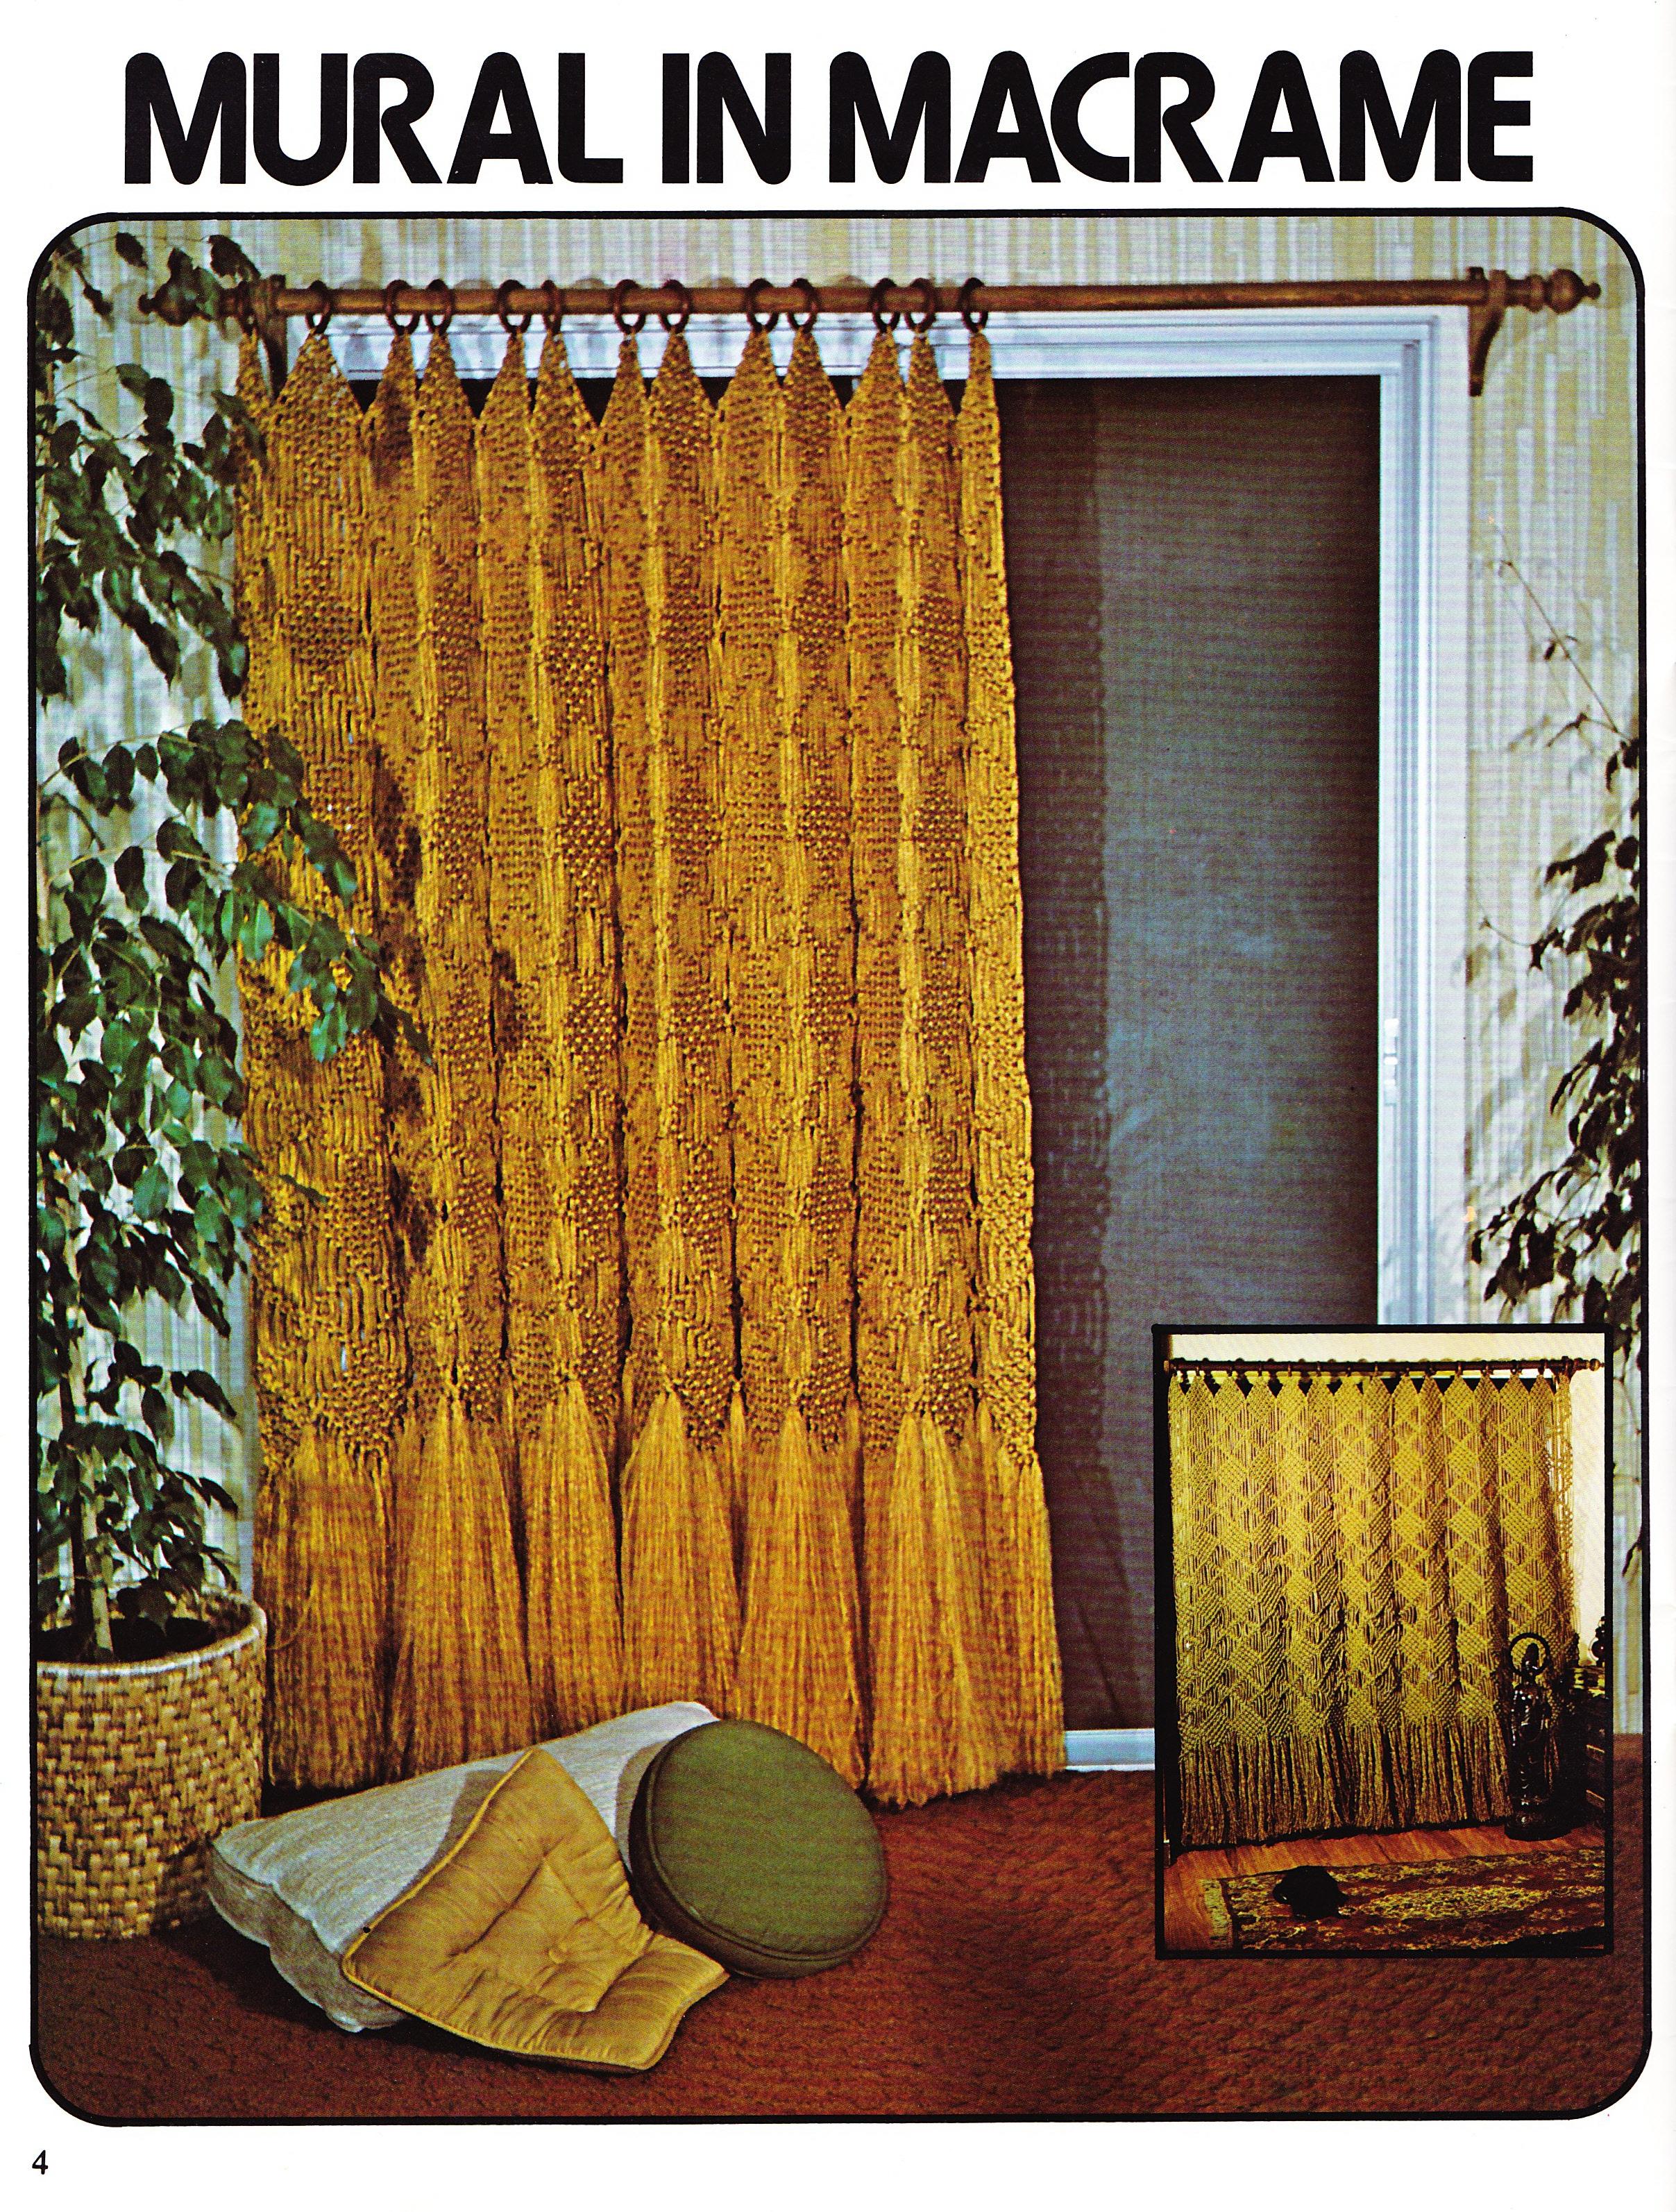 mural in macrame long drape macrame window dressings 1979 flickr photo sharing. Black Bedroom Furniture Sets. Home Design Ideas